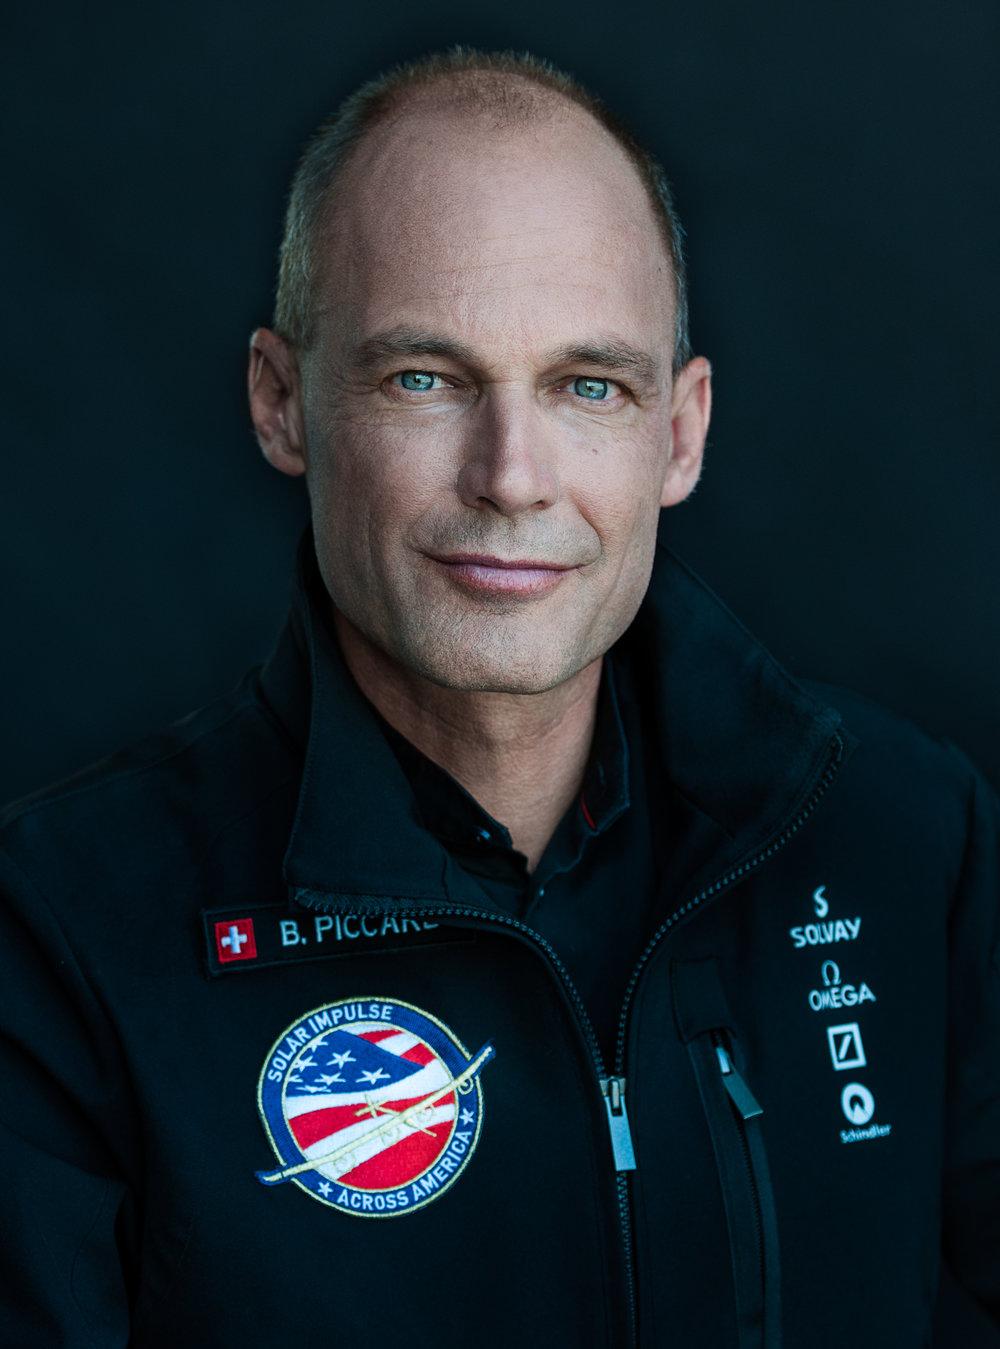 Portrait von Bertrand Piccard, Solar Impulse